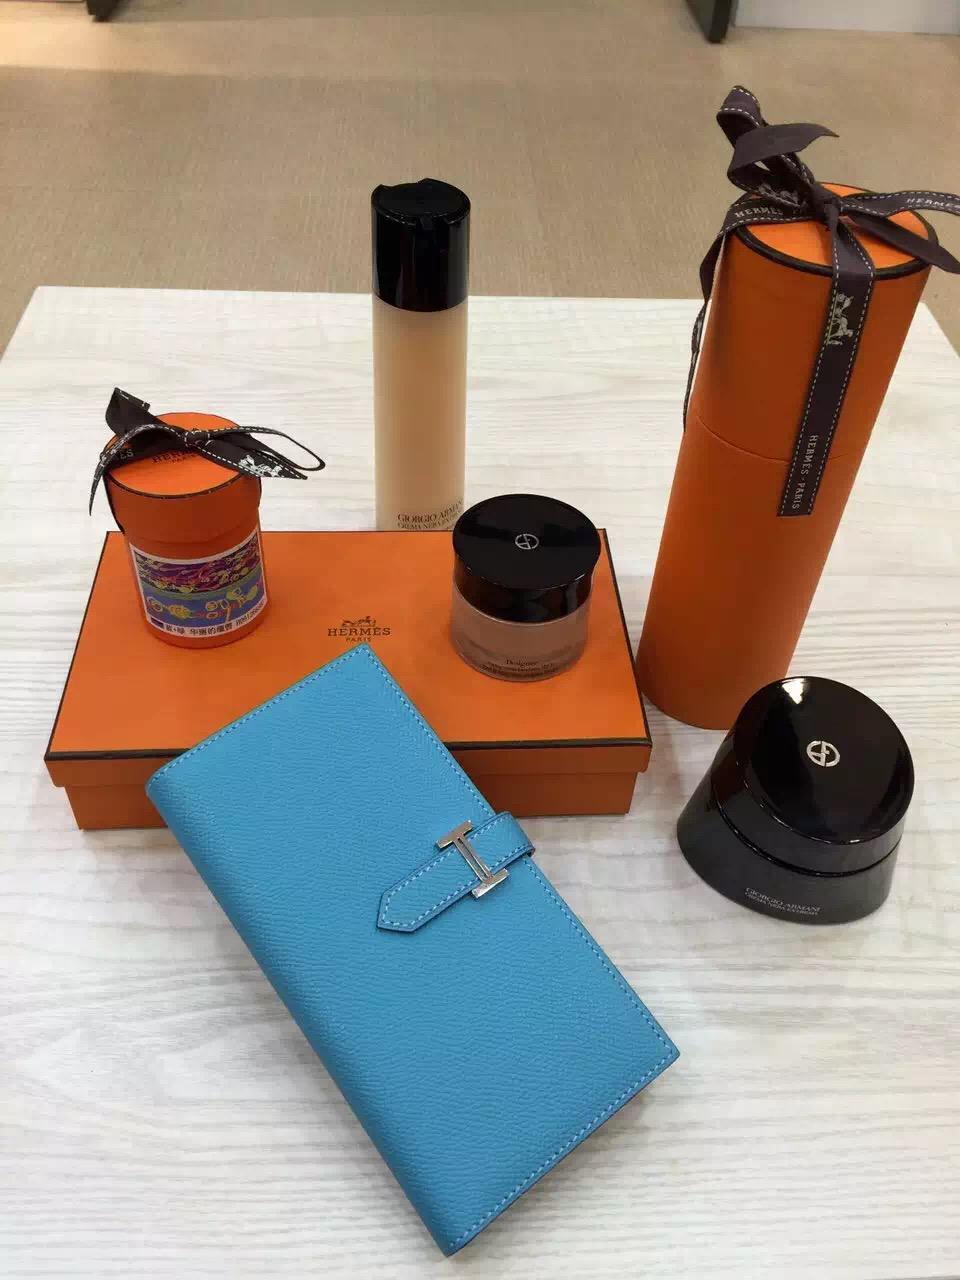 Hermes Vip Customize Epsom Leather Bearn Wallet Women's Clutch Bag Multi-color